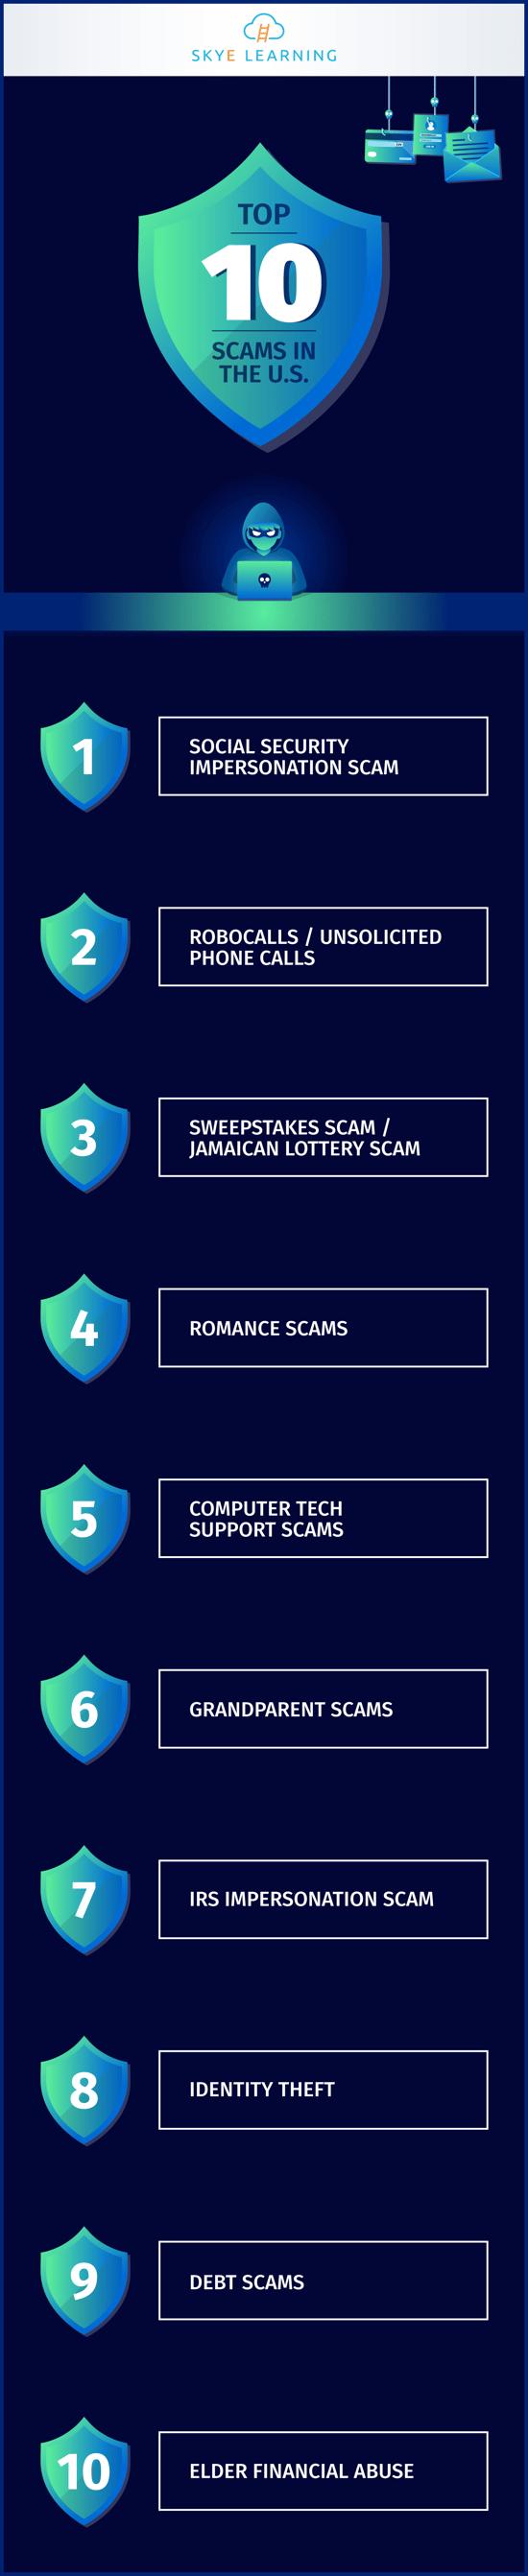 Top-10-Scams-in-the-US-IG-SKYE_2020